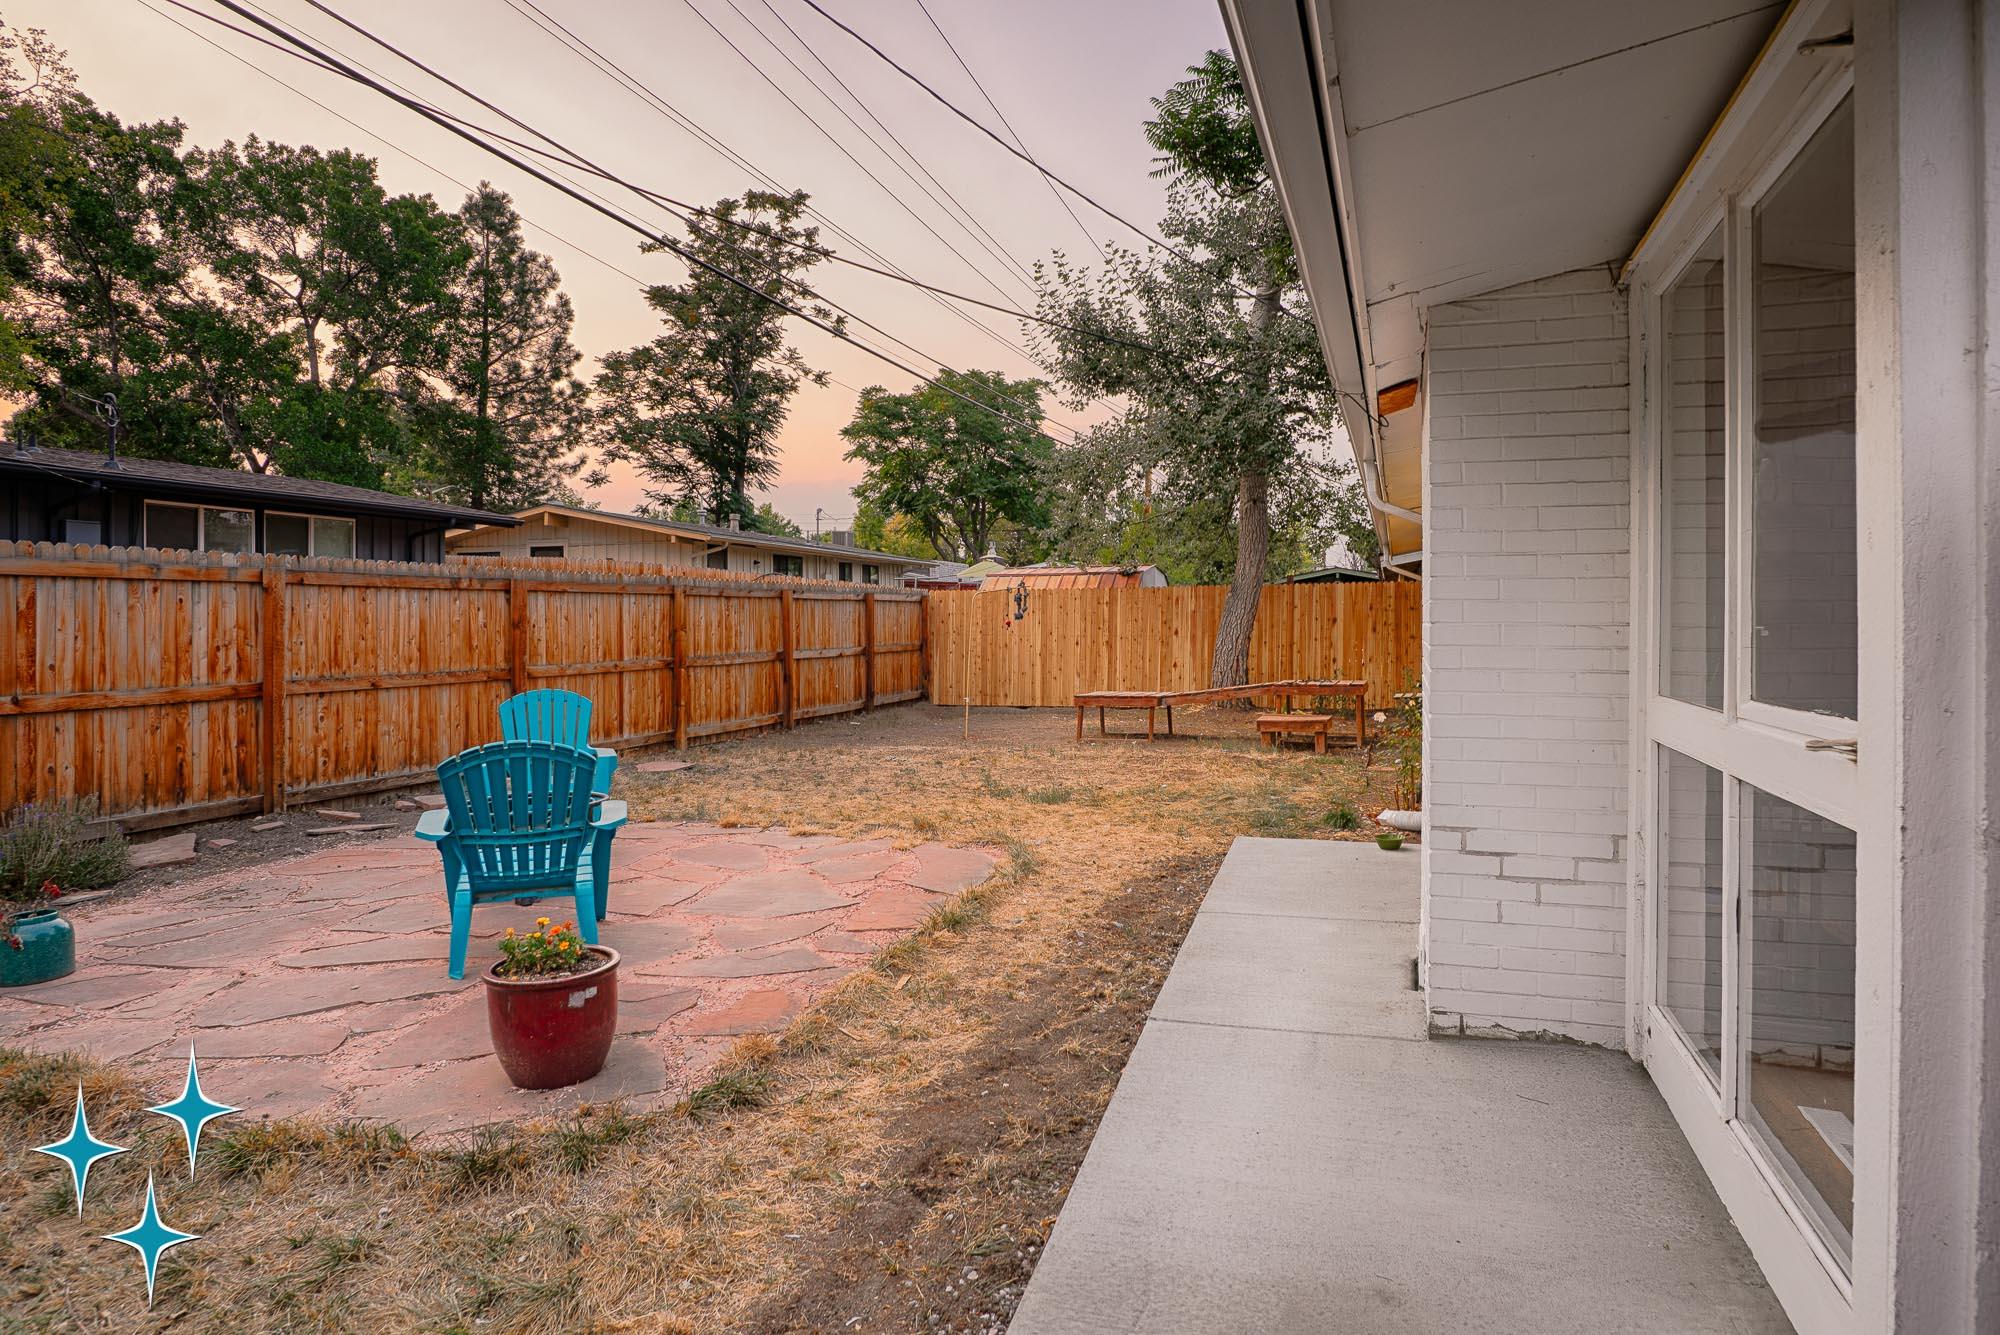 Adrian-Kinney-2325-S-Meade-Street-Denver-Cliff-May-Harvey-Park-2000w50-3SWM-28.jpg